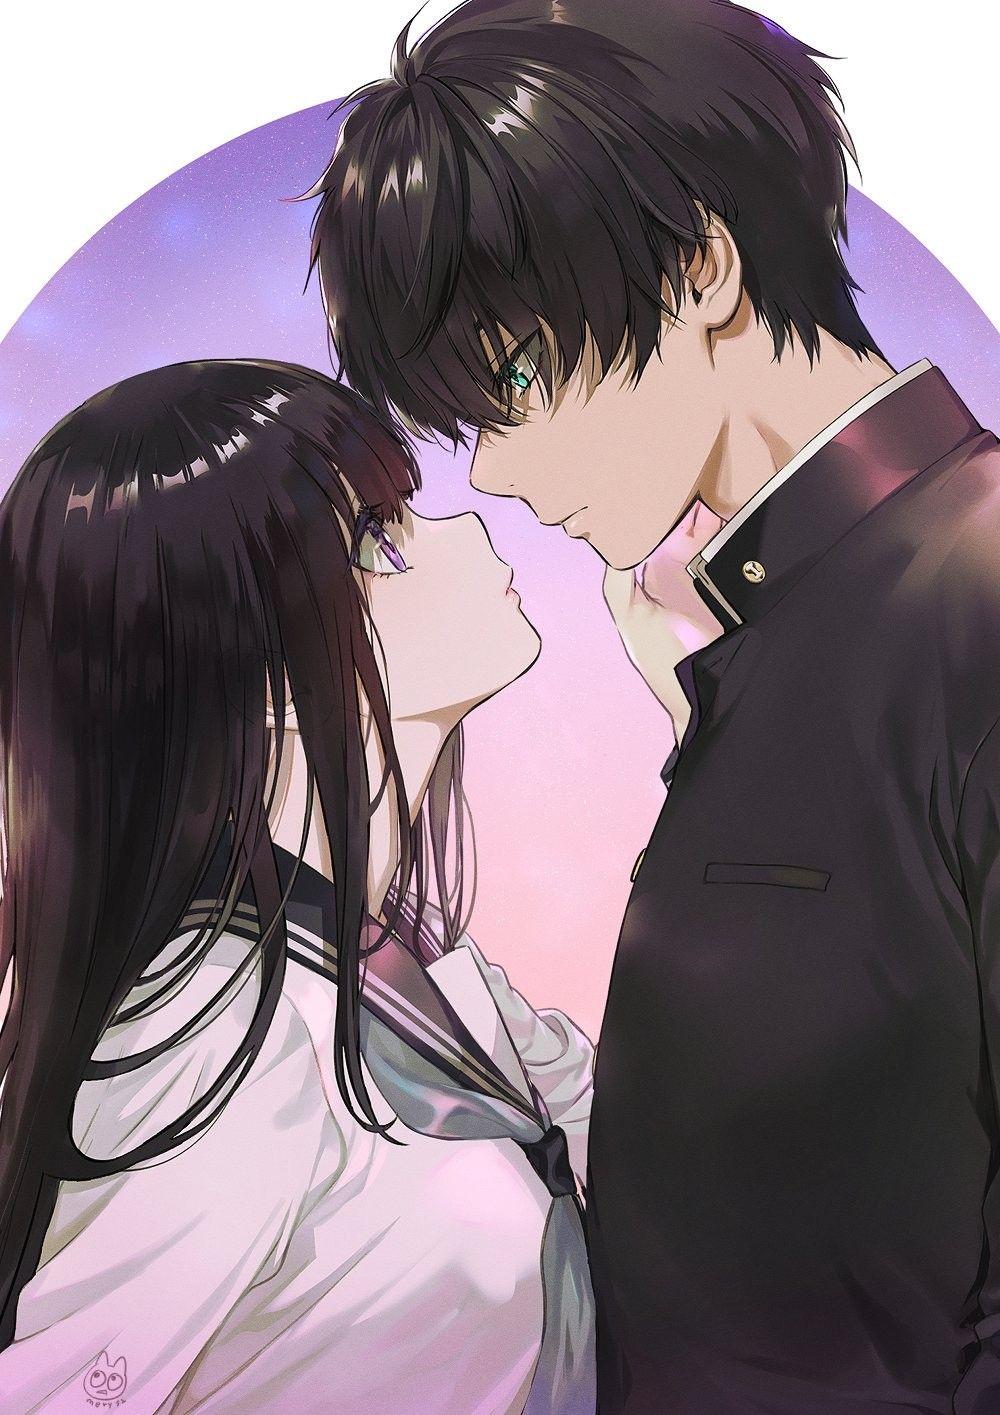 Anime Couple Fanart : anime, couple, fanart, David, González, ANIME, COUPLE, Gambar, Anime,, Ilustrasi, Kecantikan,